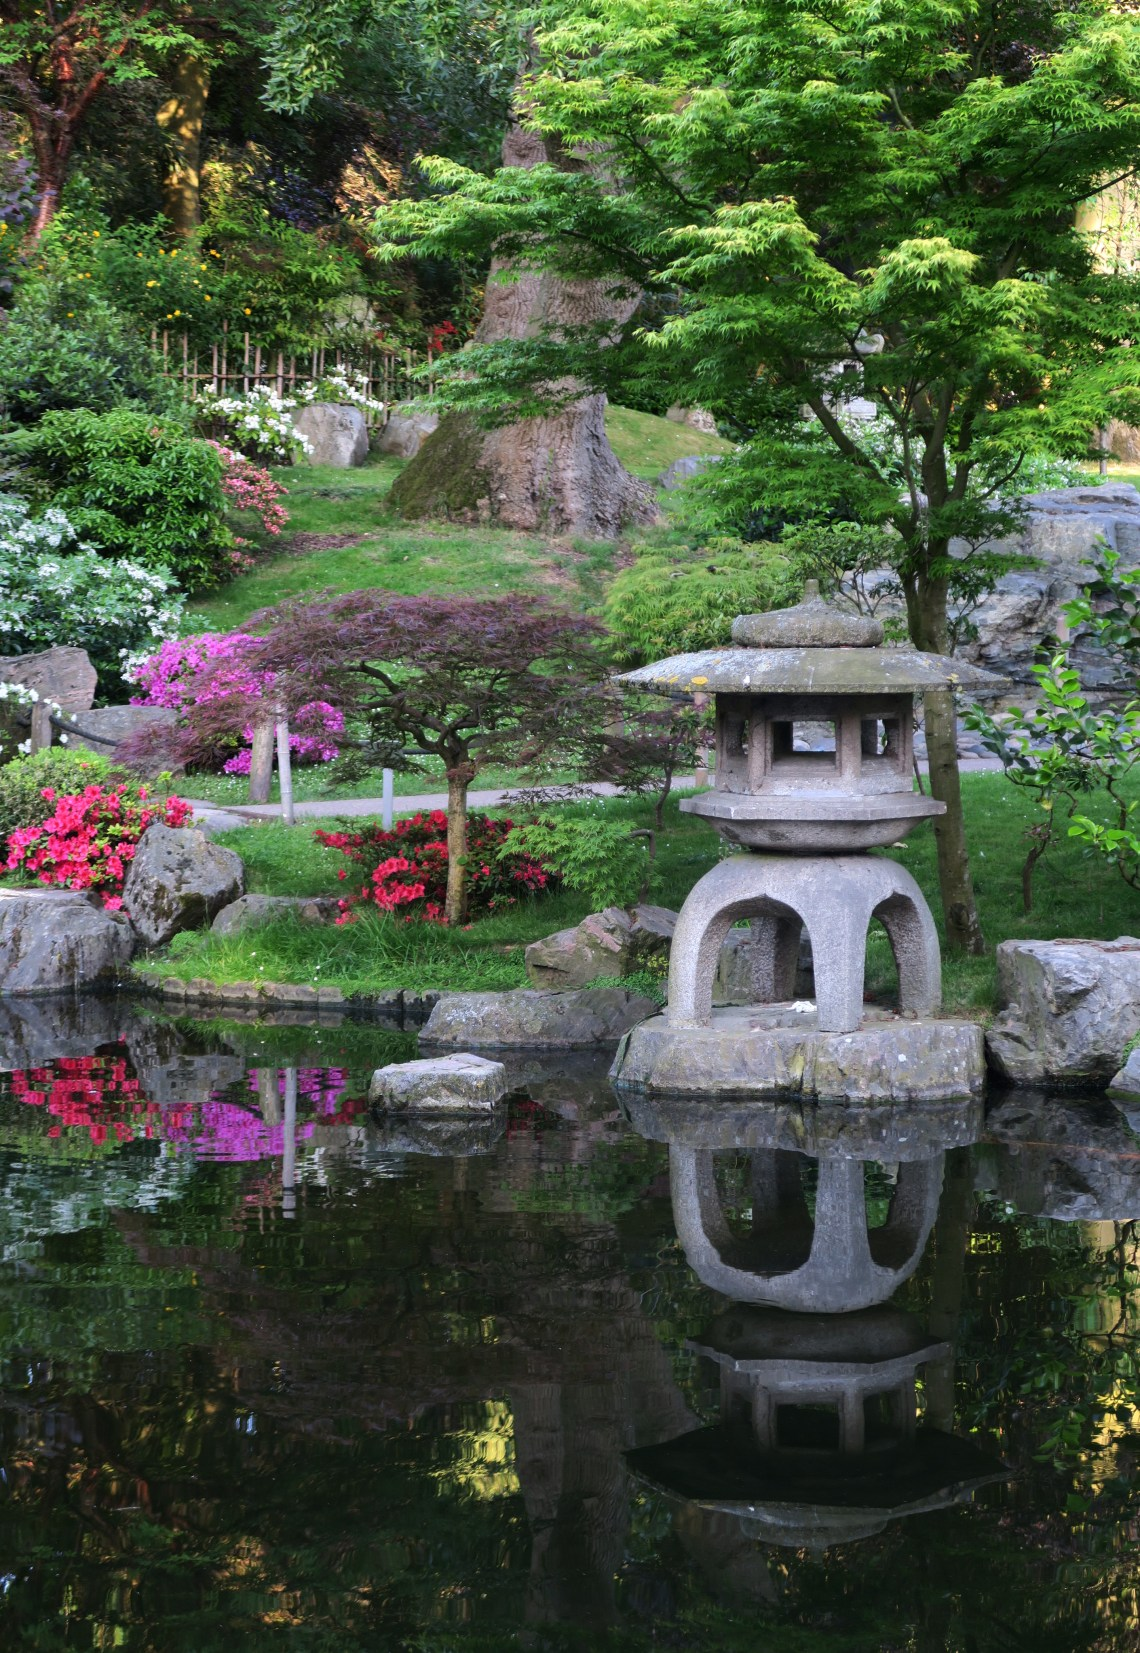 kyoto garden - holland park - parques de londres - turismo - inglaterra